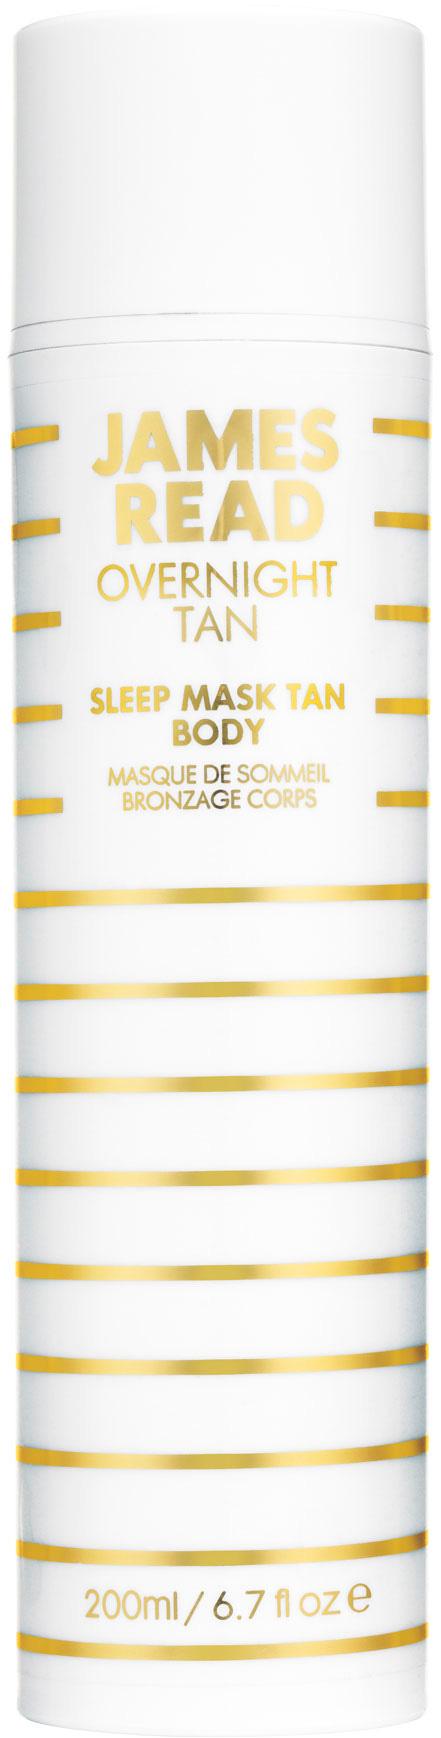 James Read - Gradual Tan - Sleep Mask Tan Body 200 ml